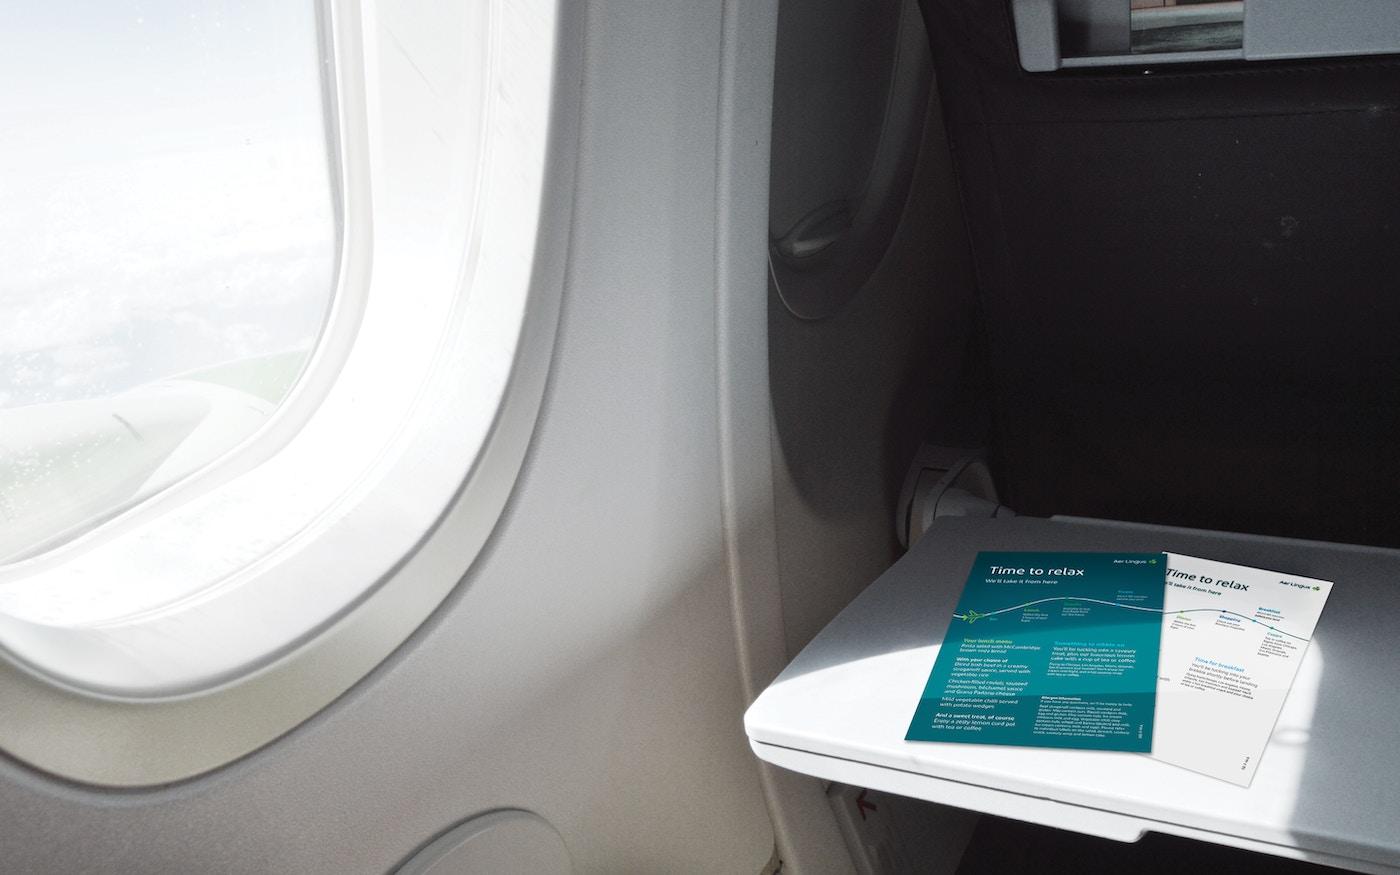 Aer Lingus in-flight design